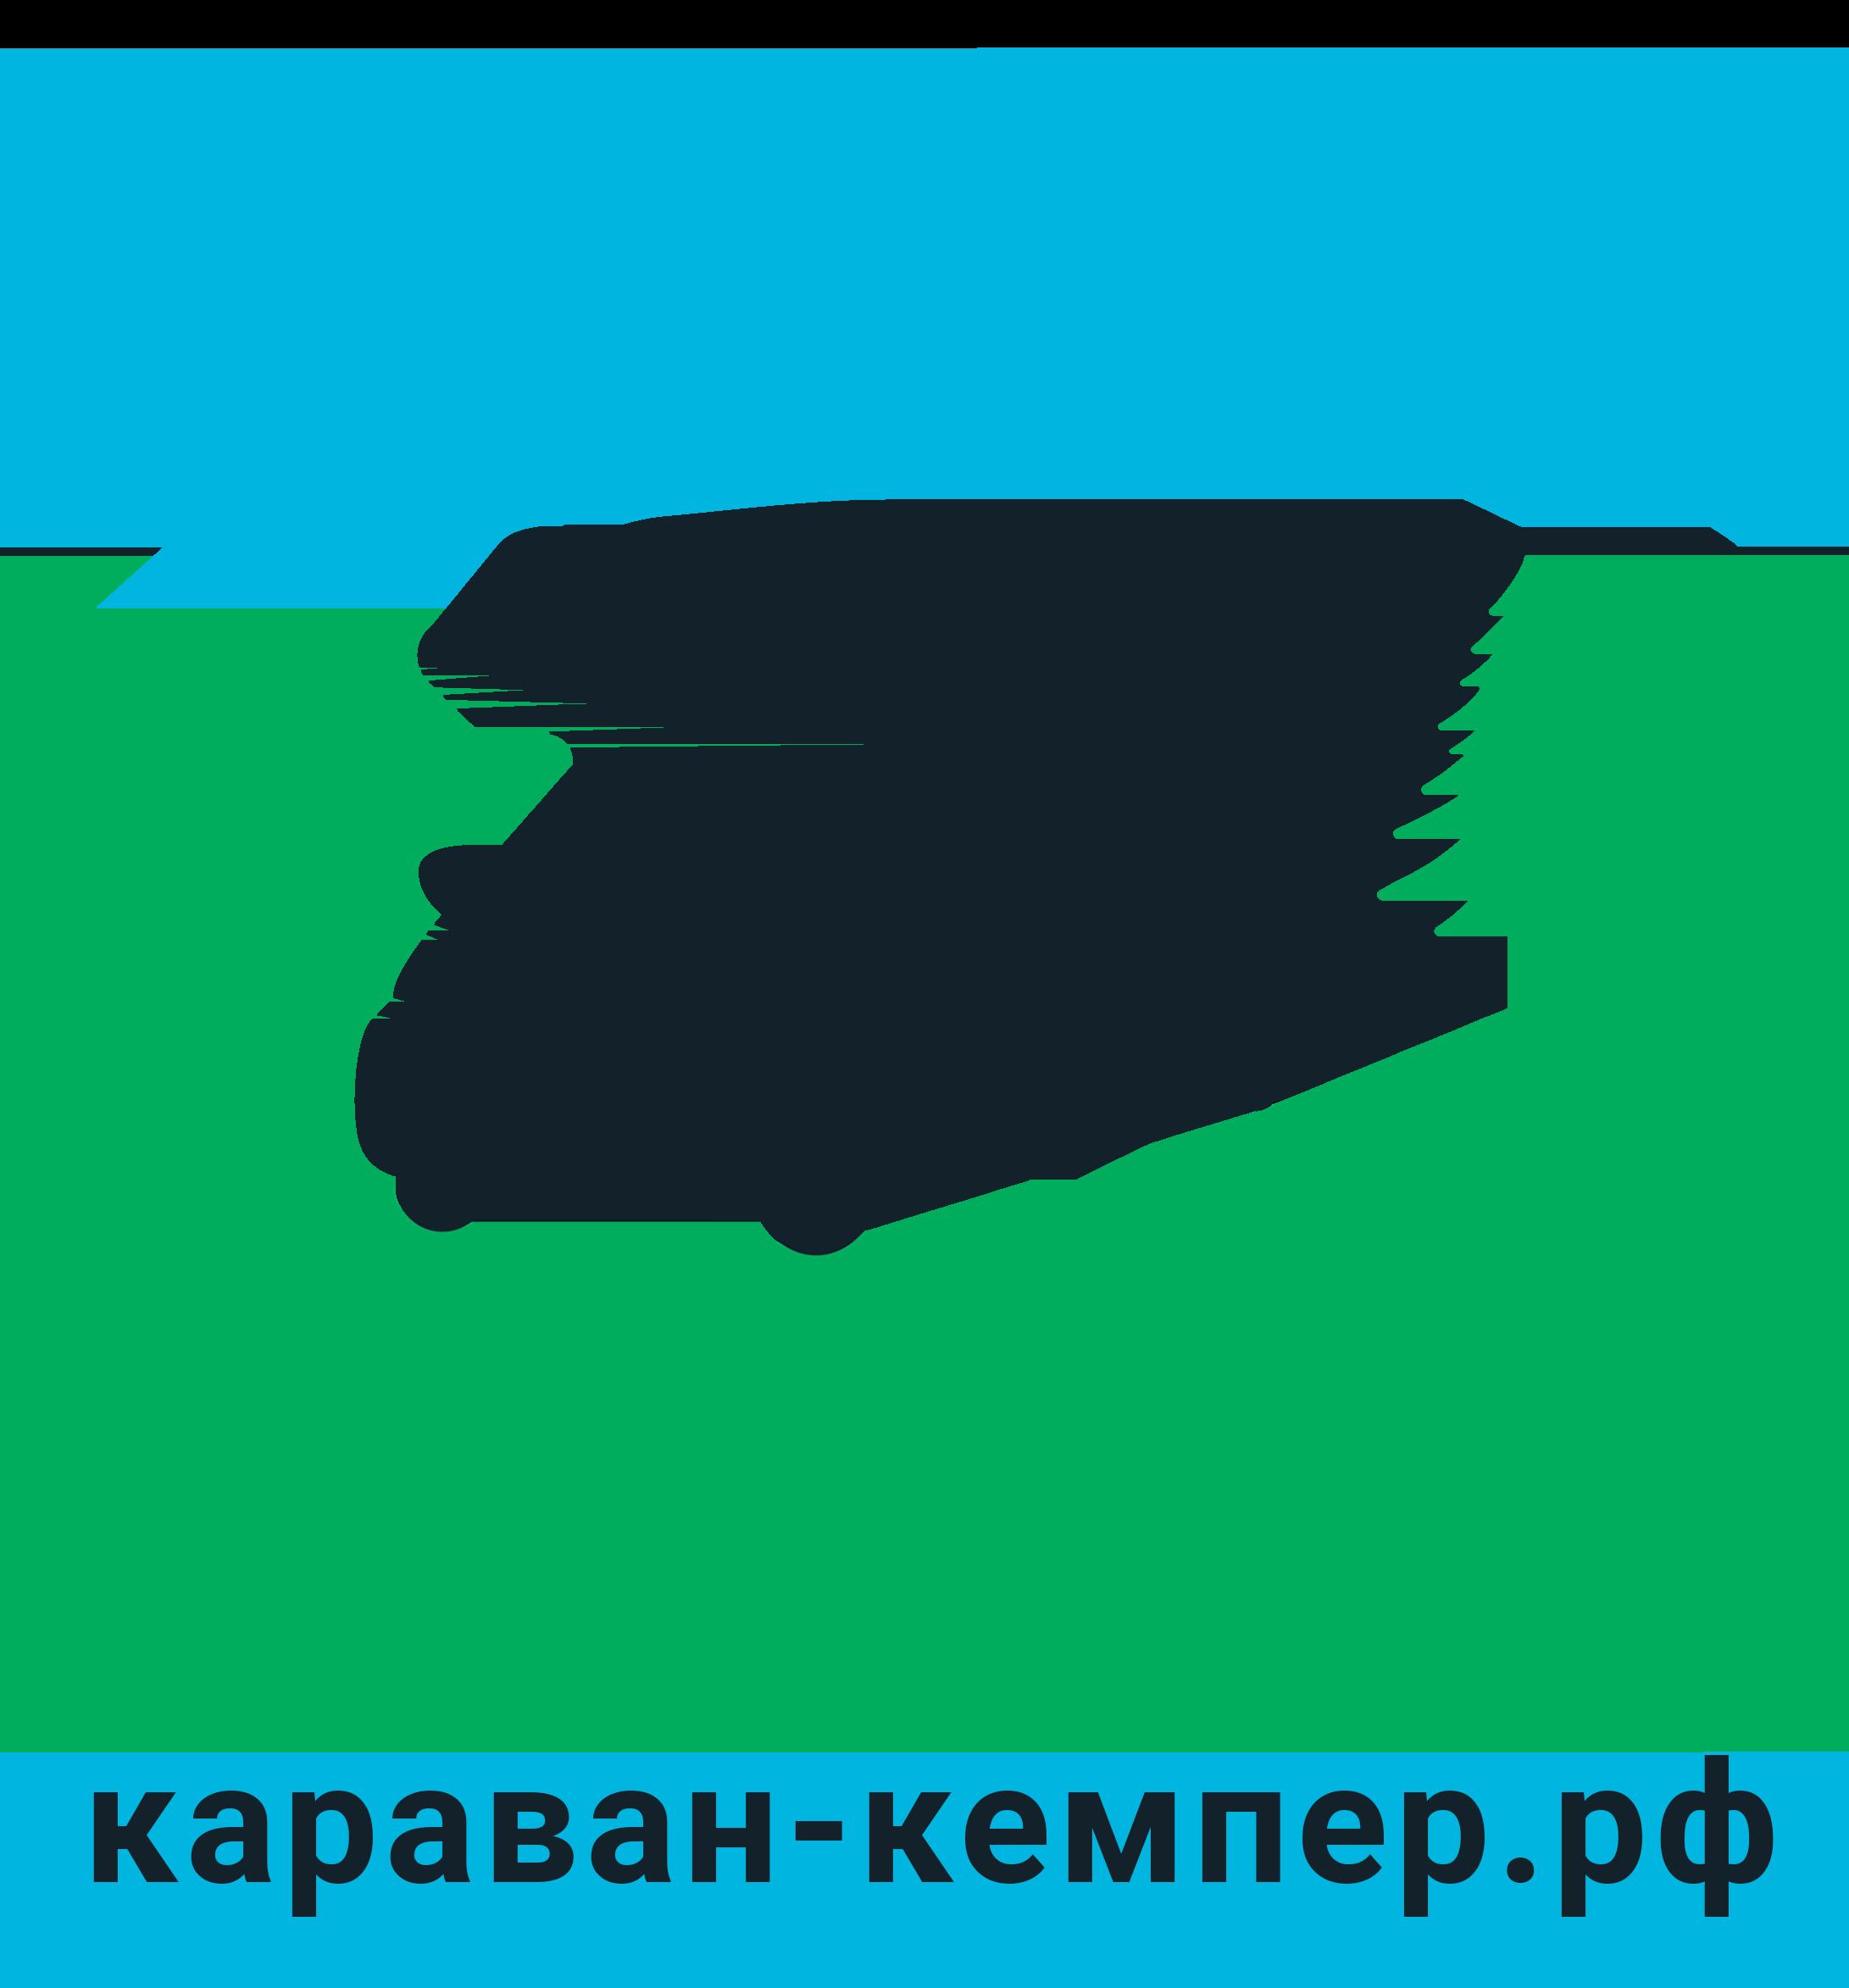 караван-кемпер.рф